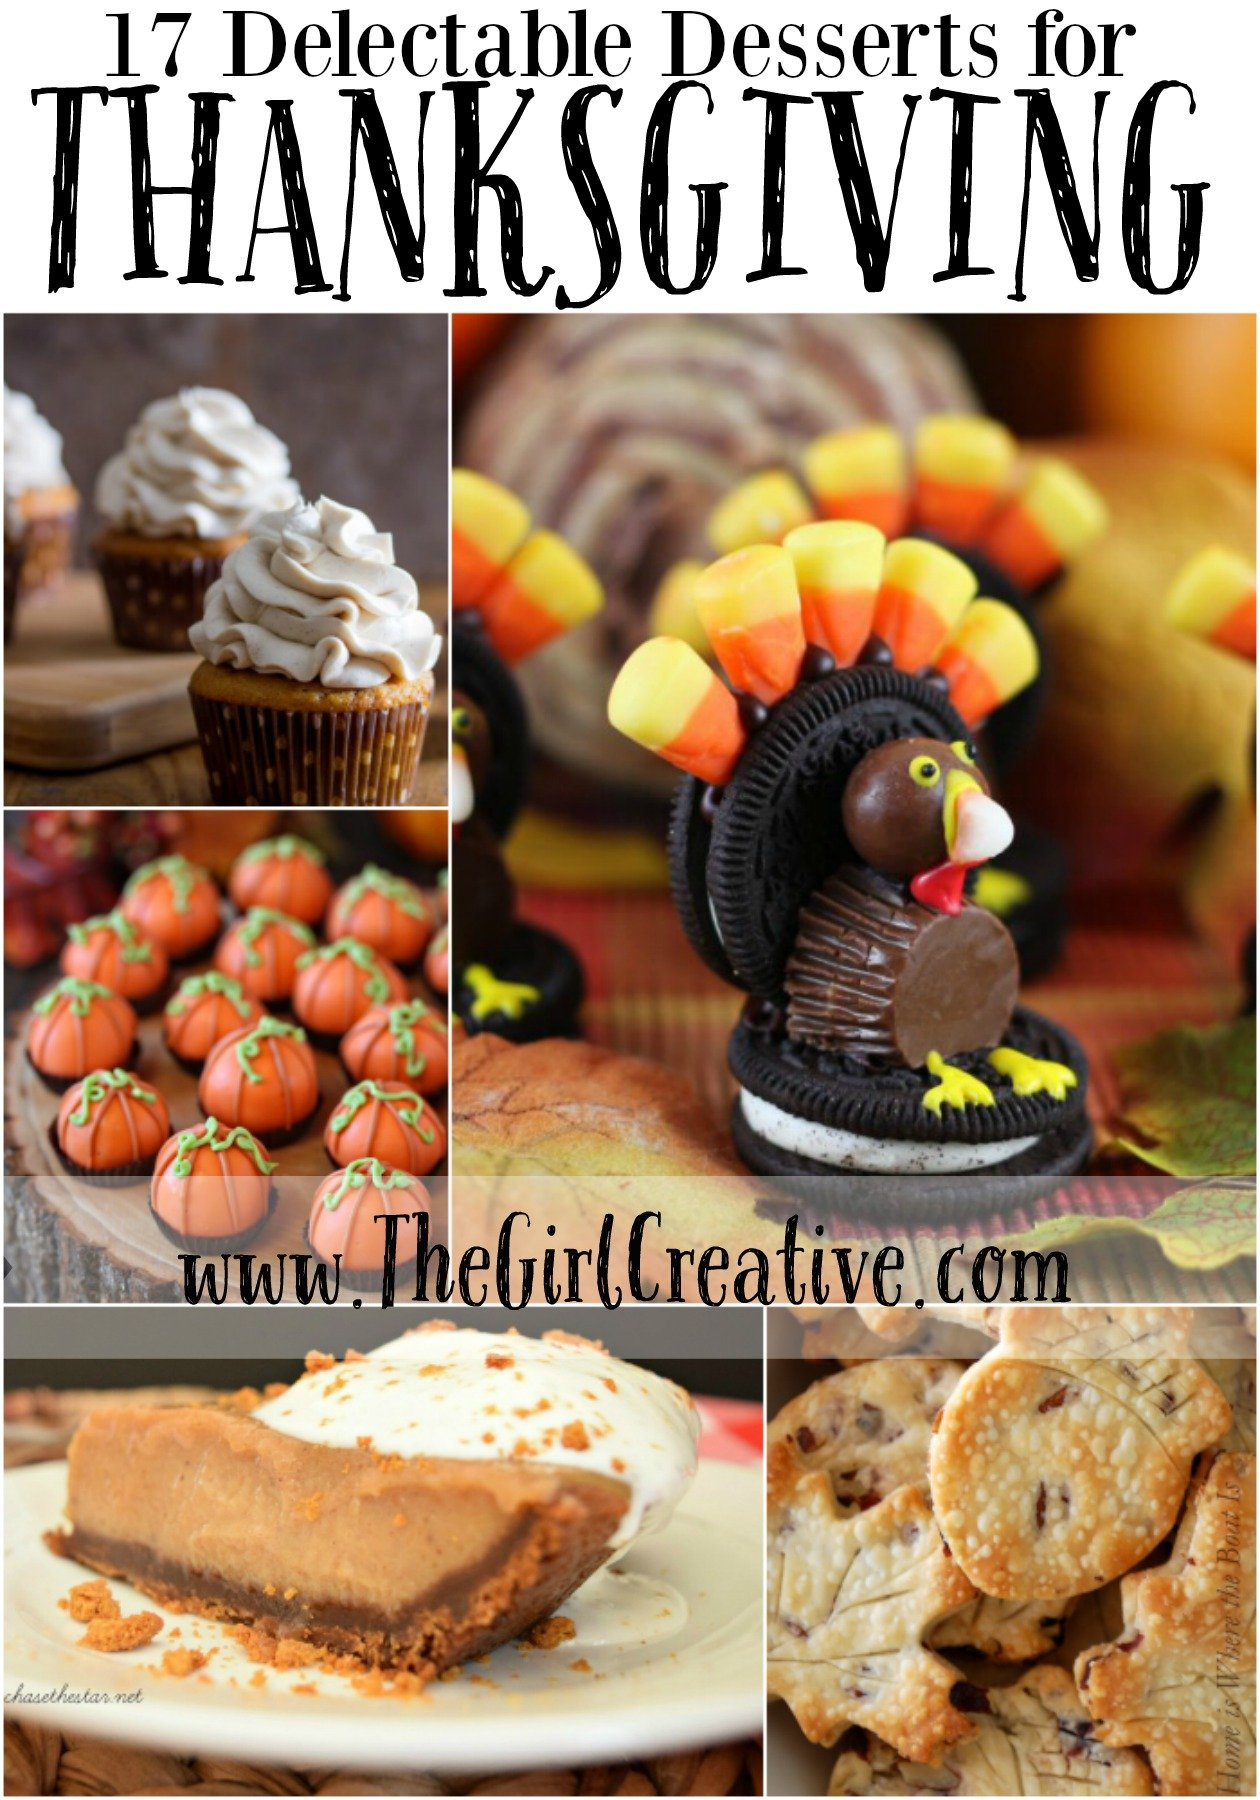 17 Delectable Desserts for Thanksgiving thegirlcreative.com